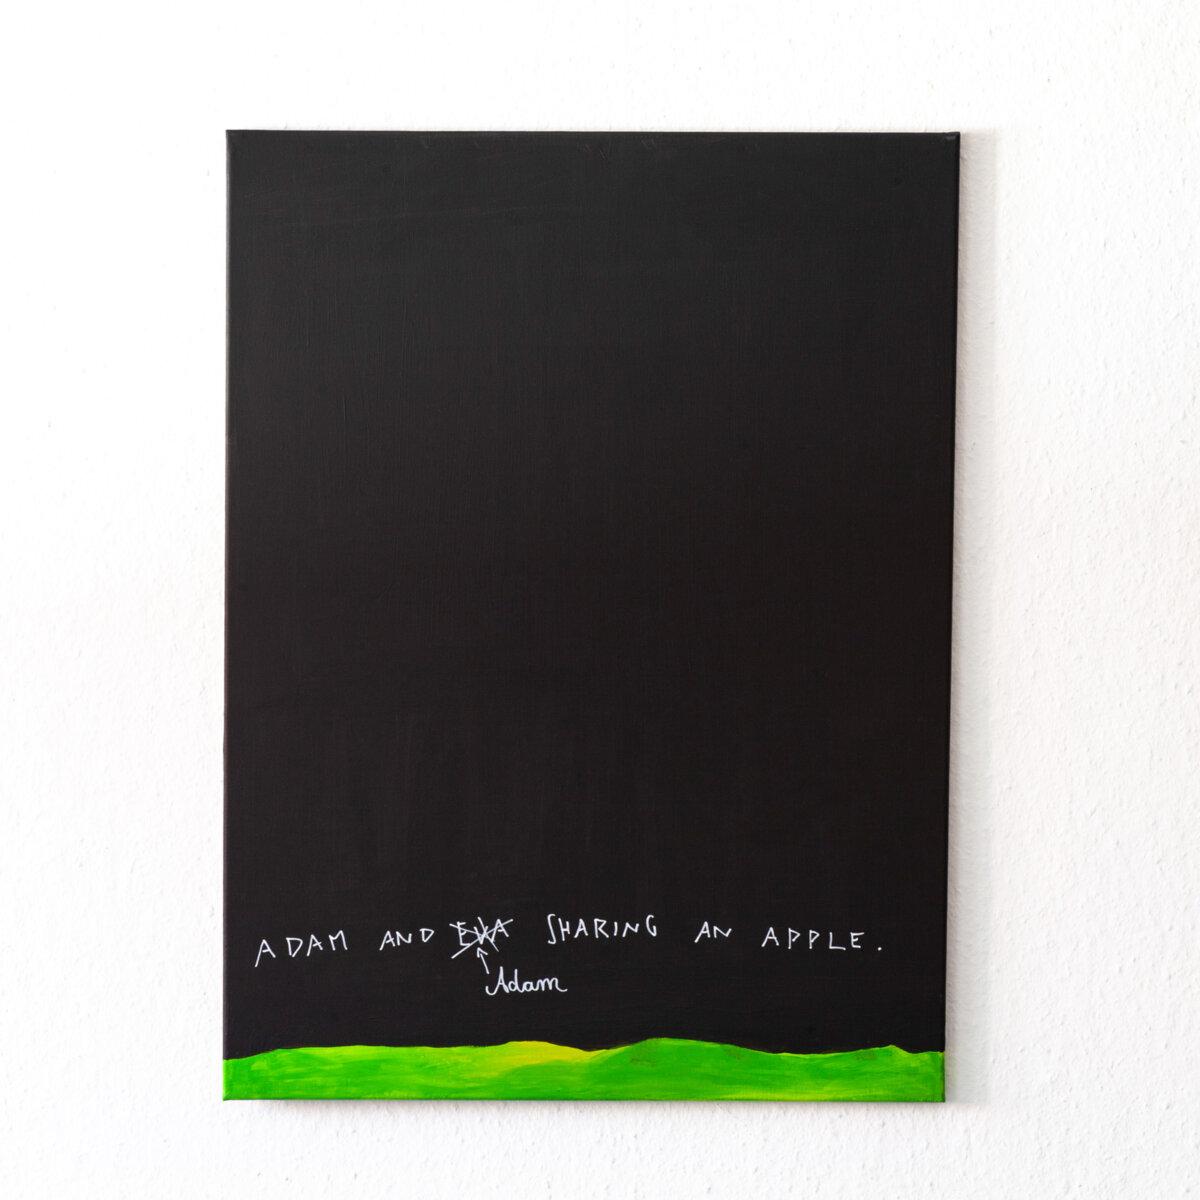 We grew up with love stories - Denis Grau